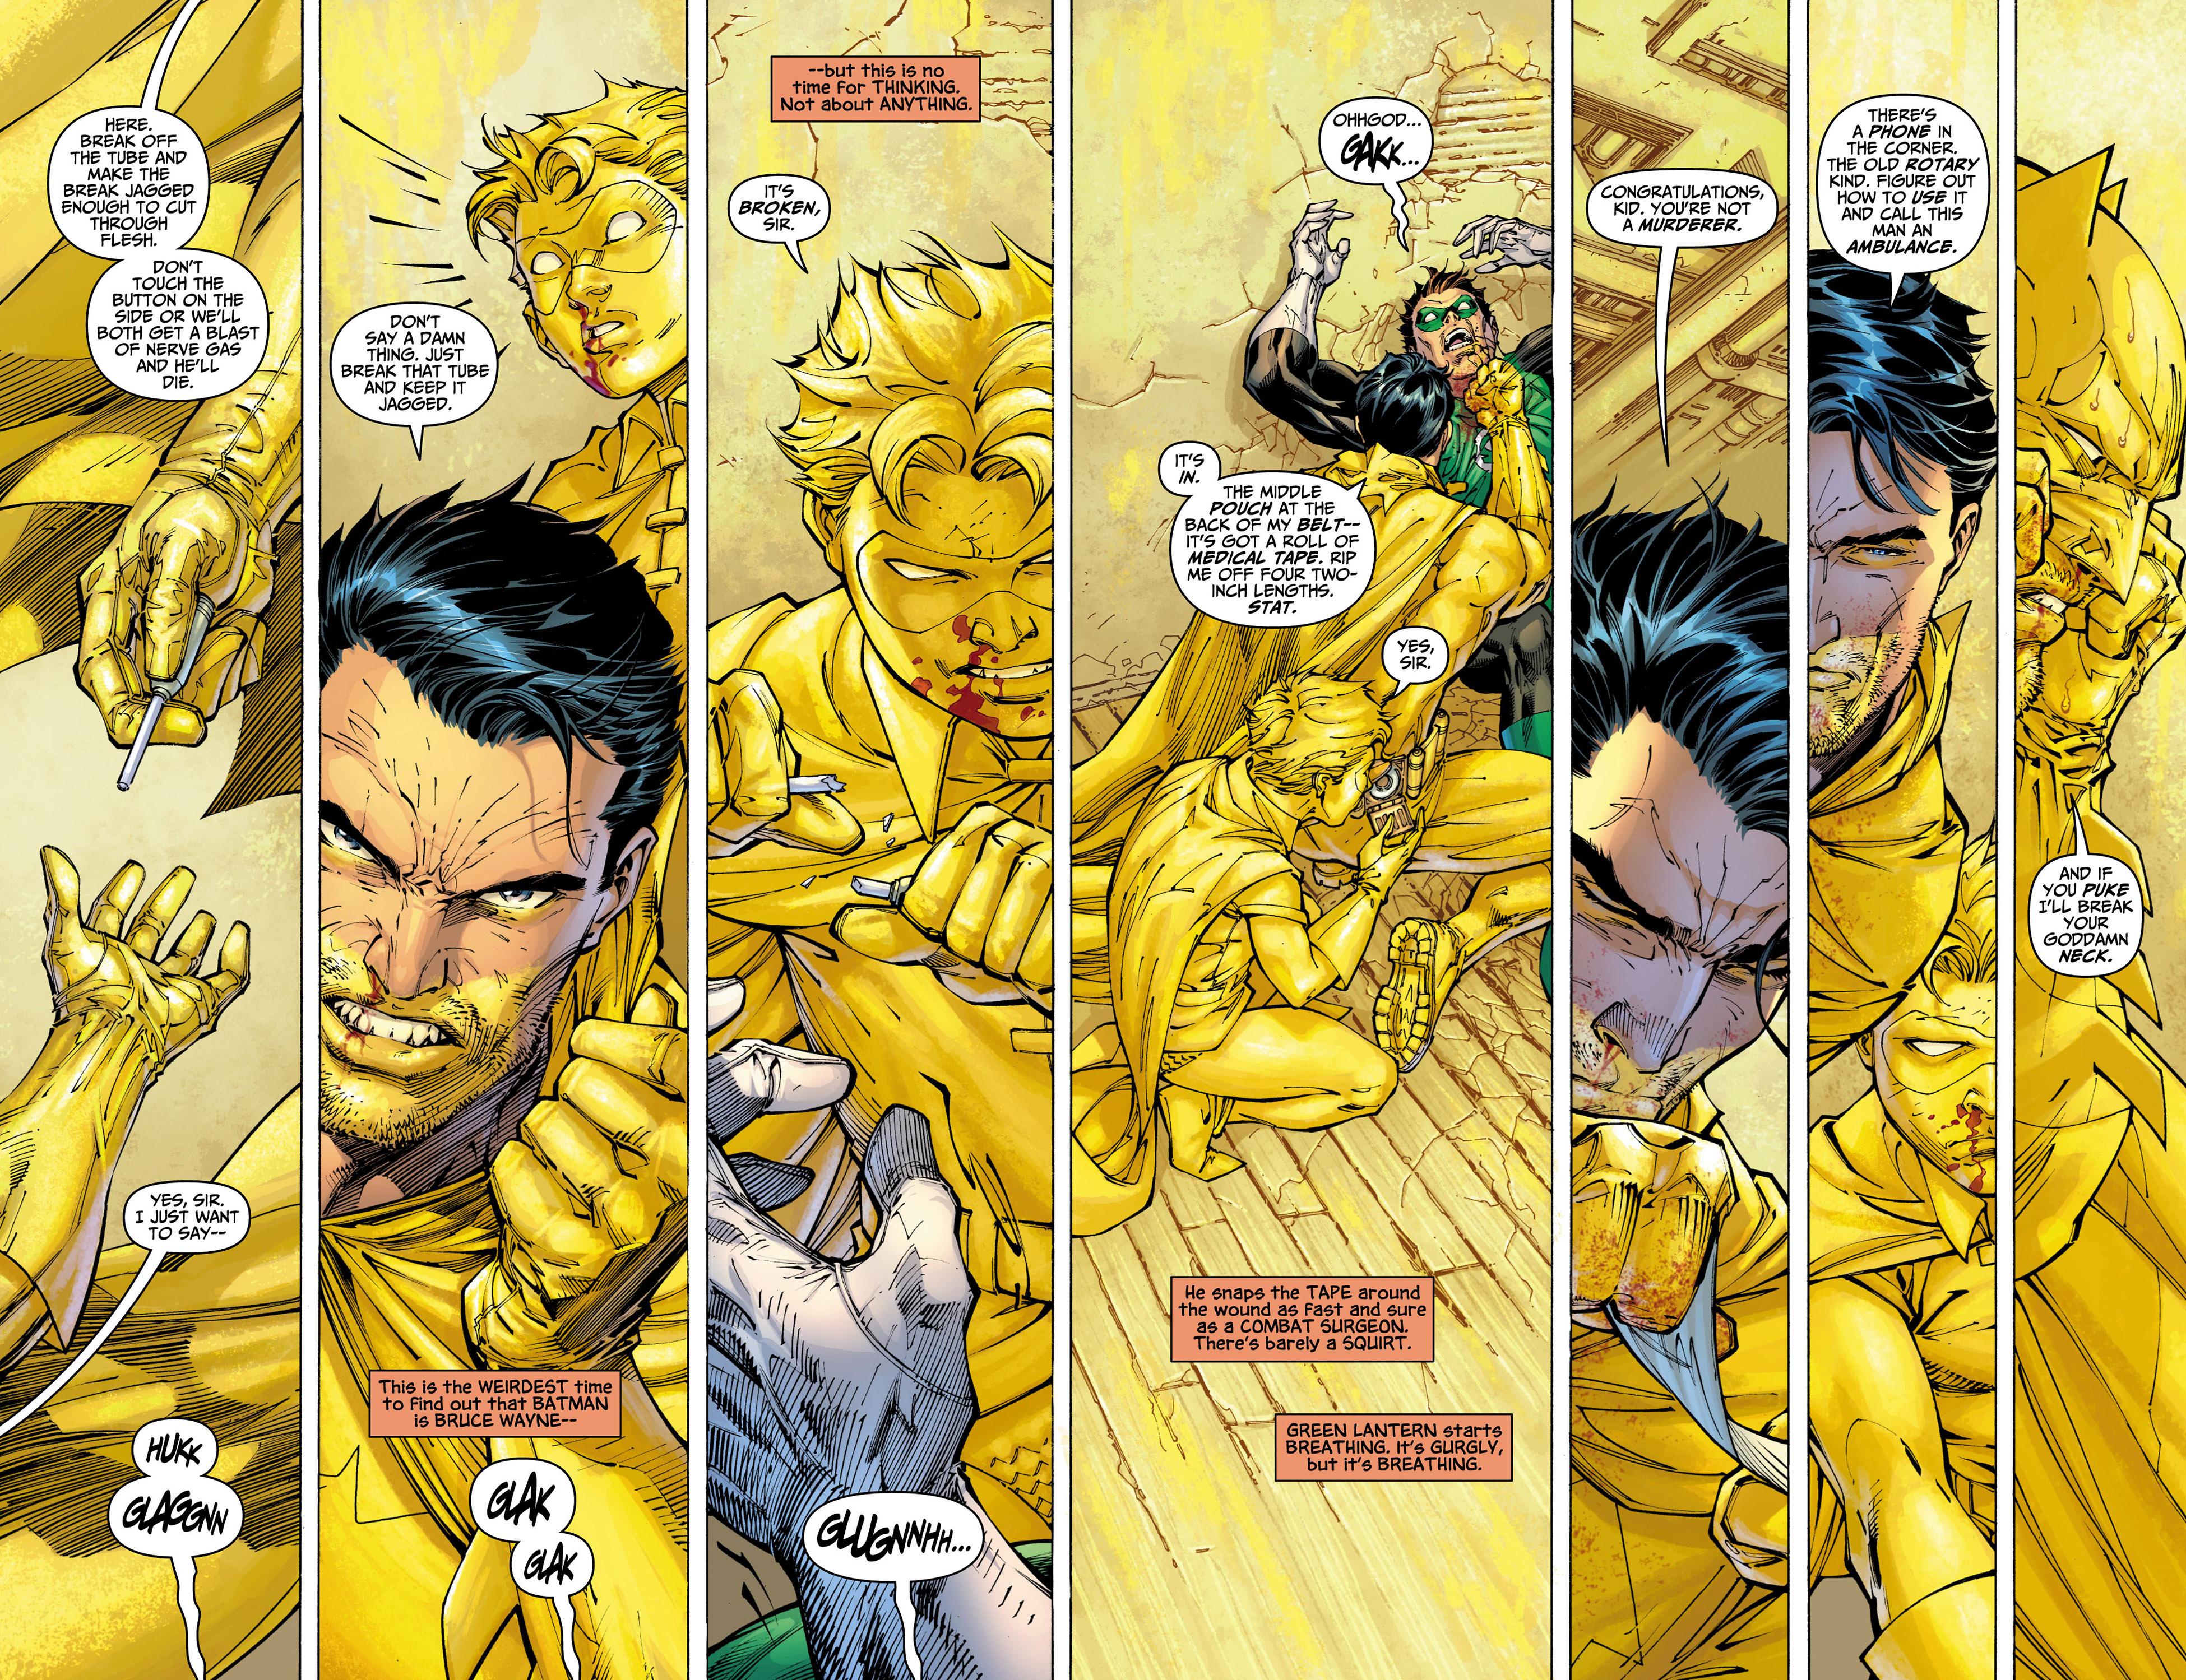 Read online All Star Batman & Robin, The Boy Wonder comic -  Issue #9 - 16